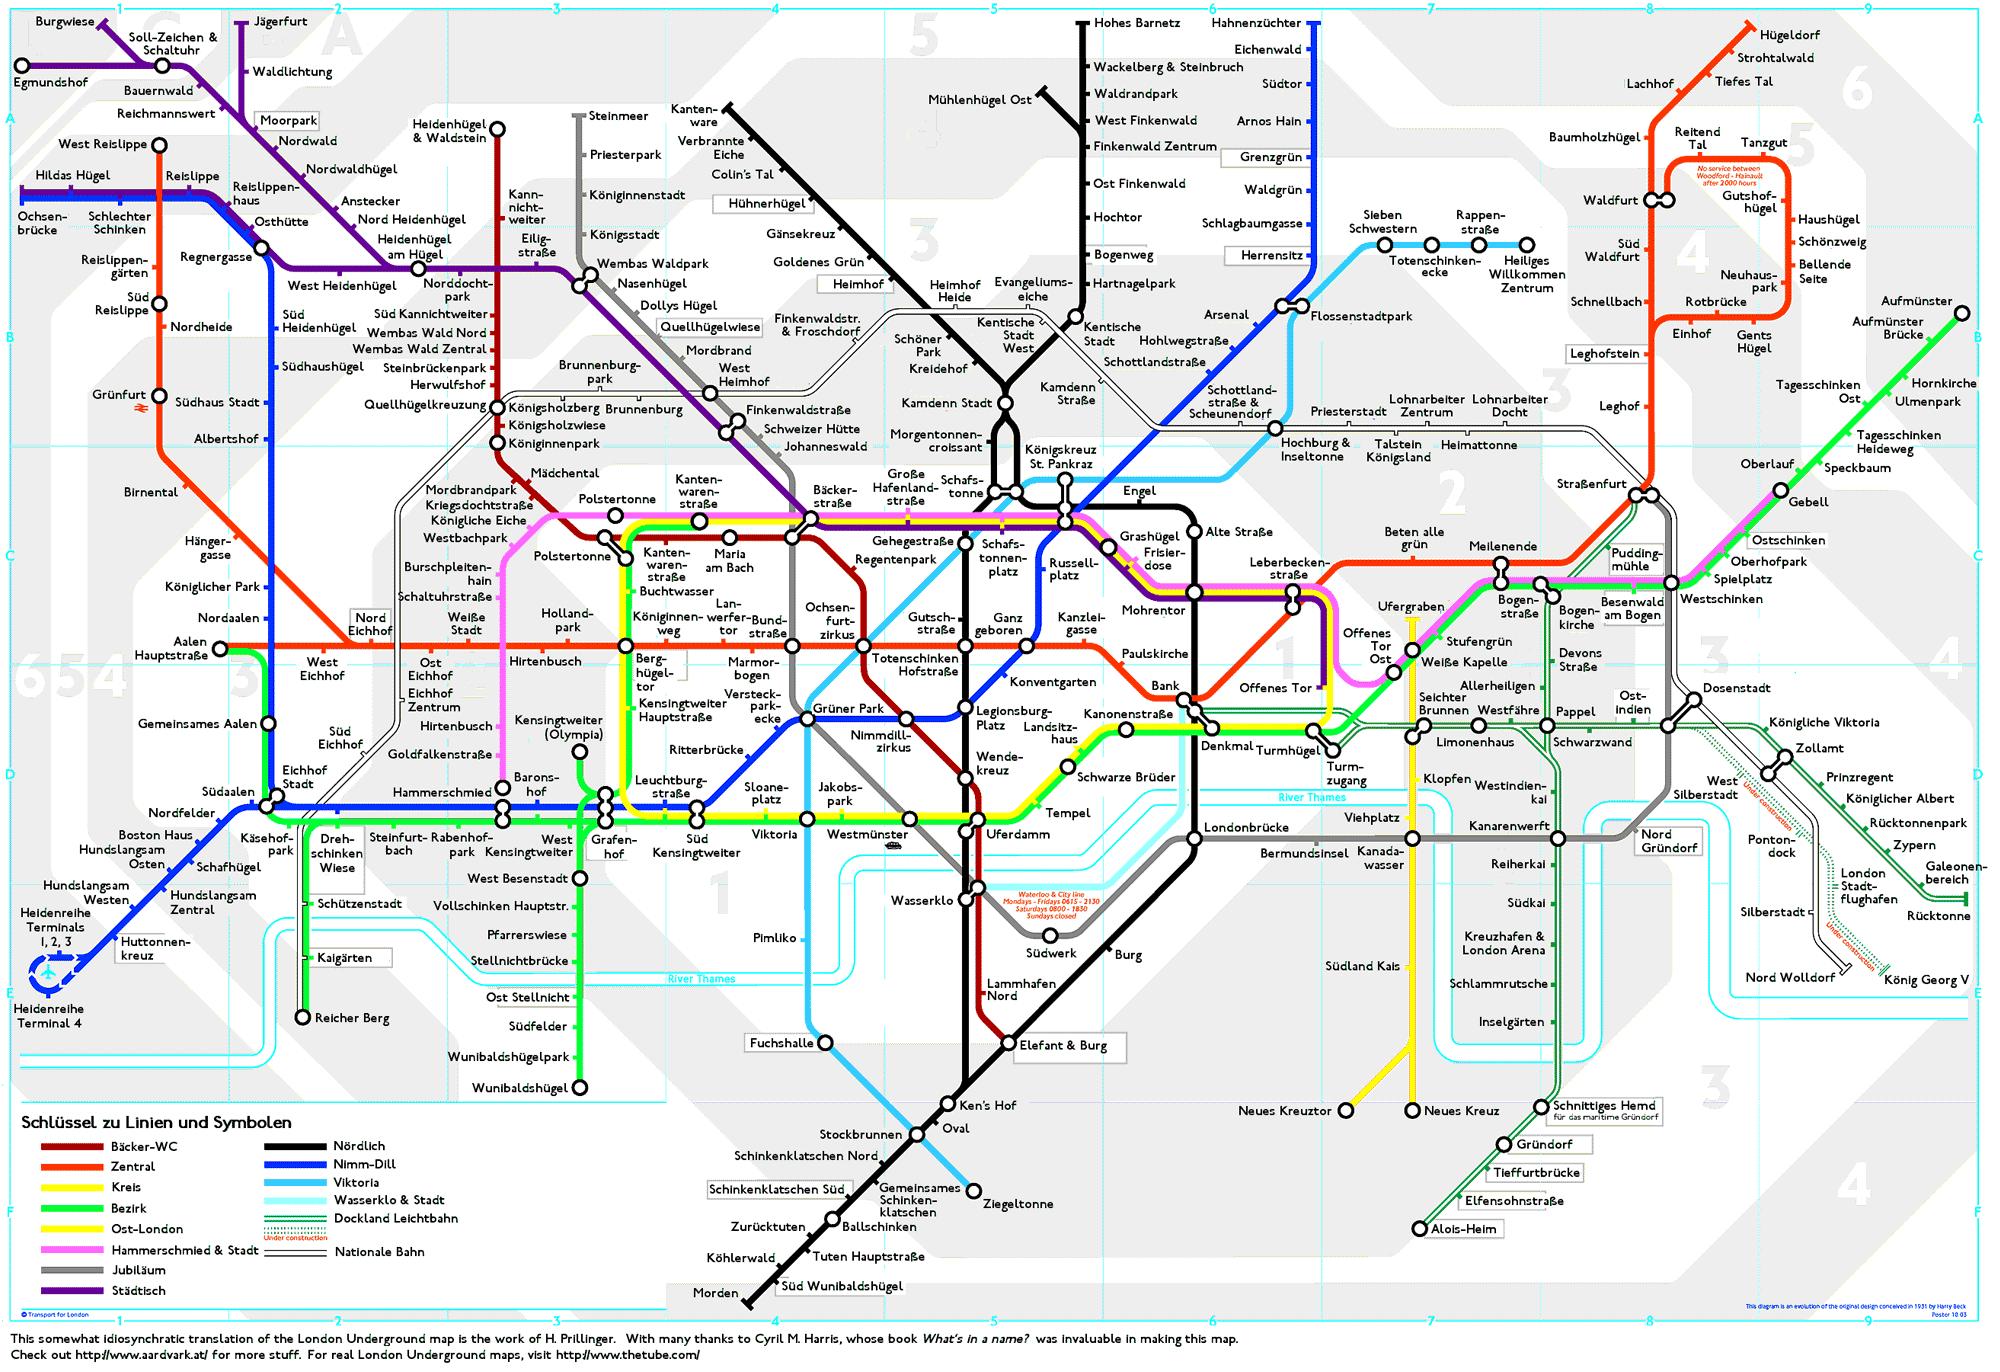 London Underground Map Translated Into German | Londoner U-Bahn-Plan - London Tube Map Printable